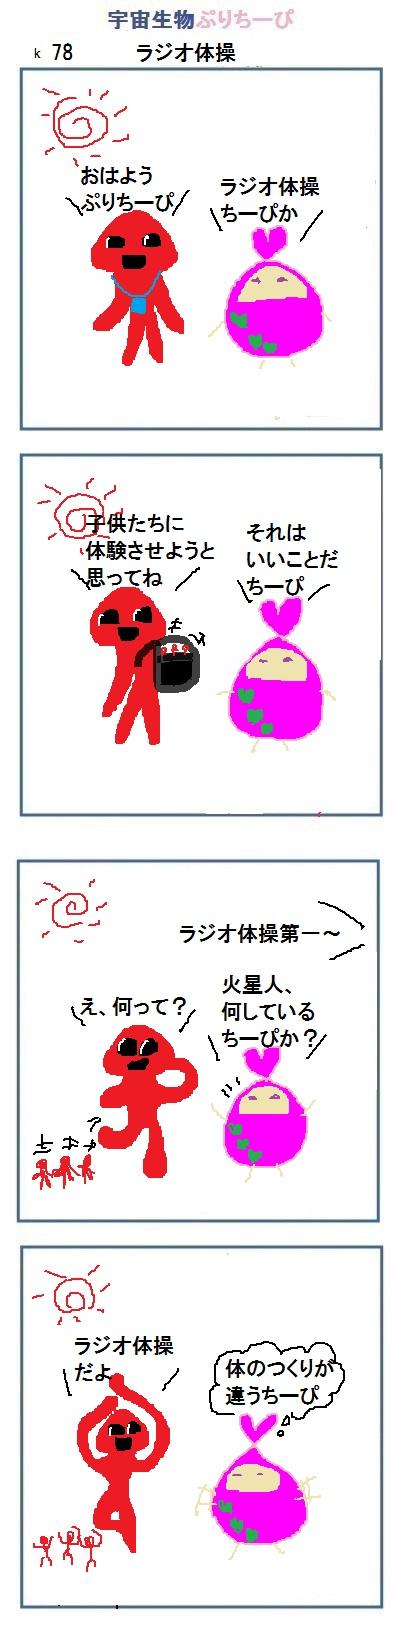 160822_k78.jpg